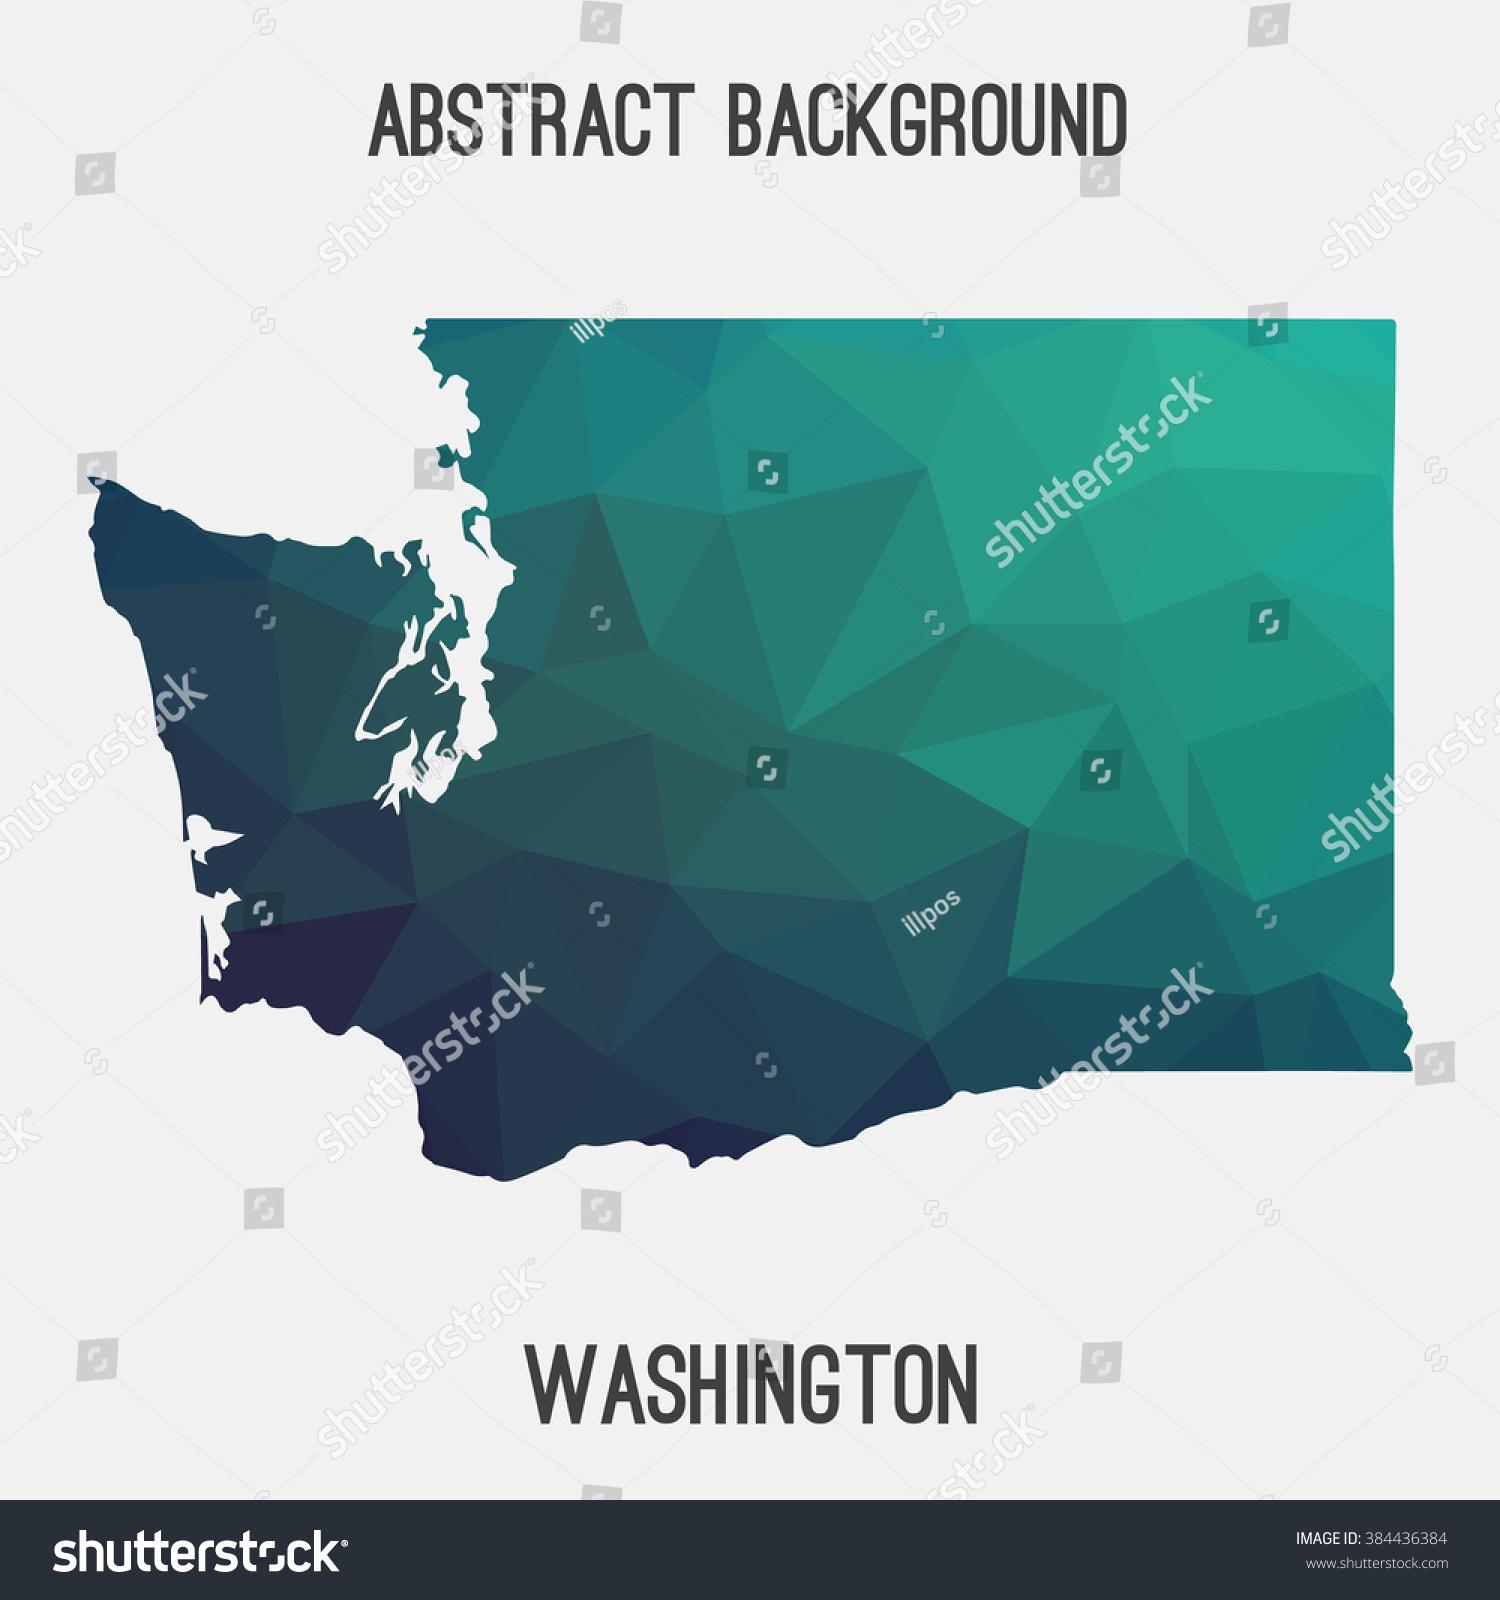 Washington State Map Geometric Polygonal Style Abstract Stock ...